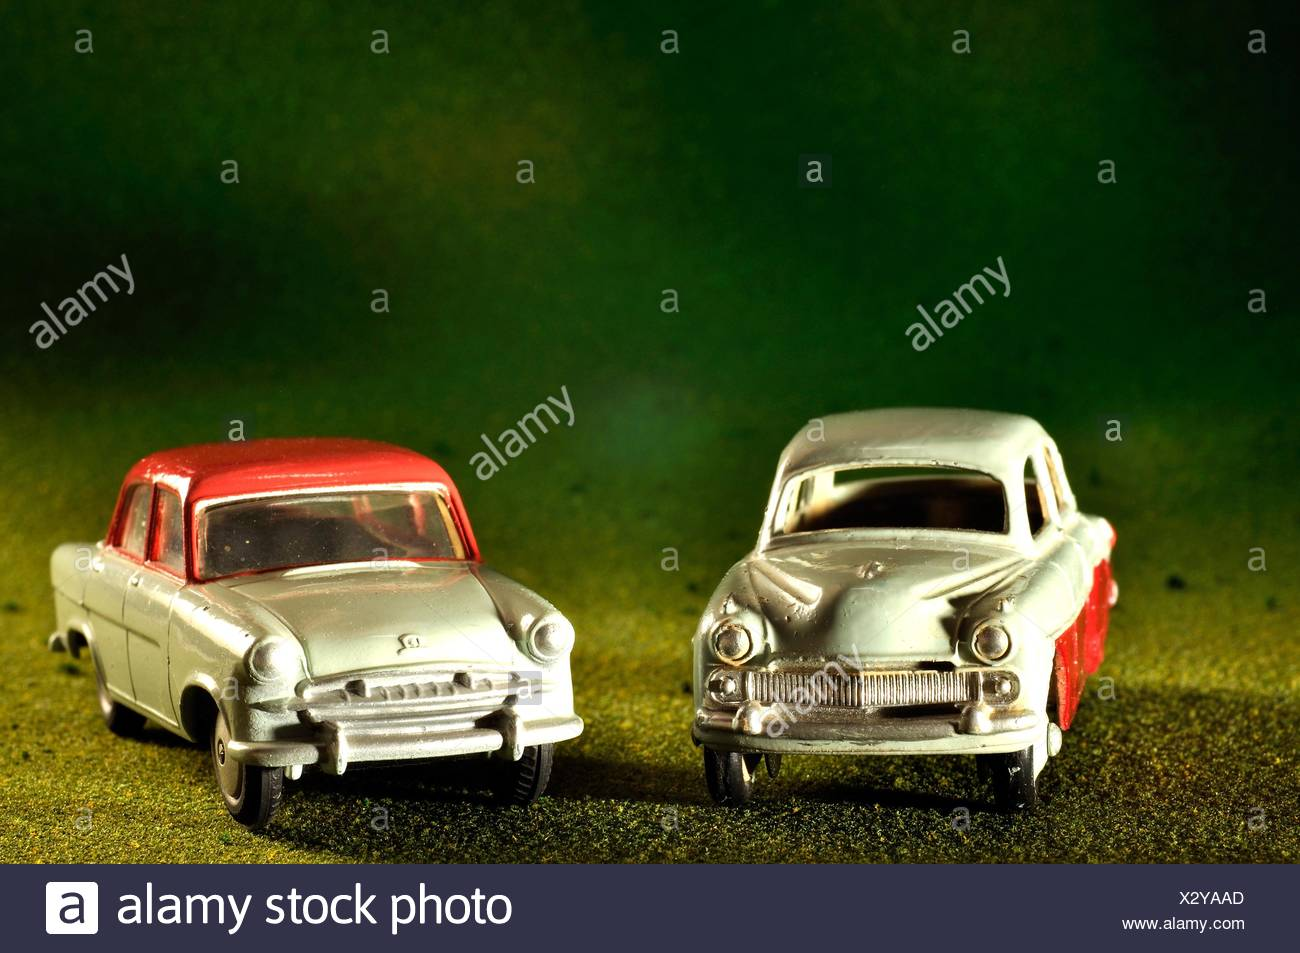 Vanguard Vintage Car Stock Photos & Vanguard Vintage Car Stock ...